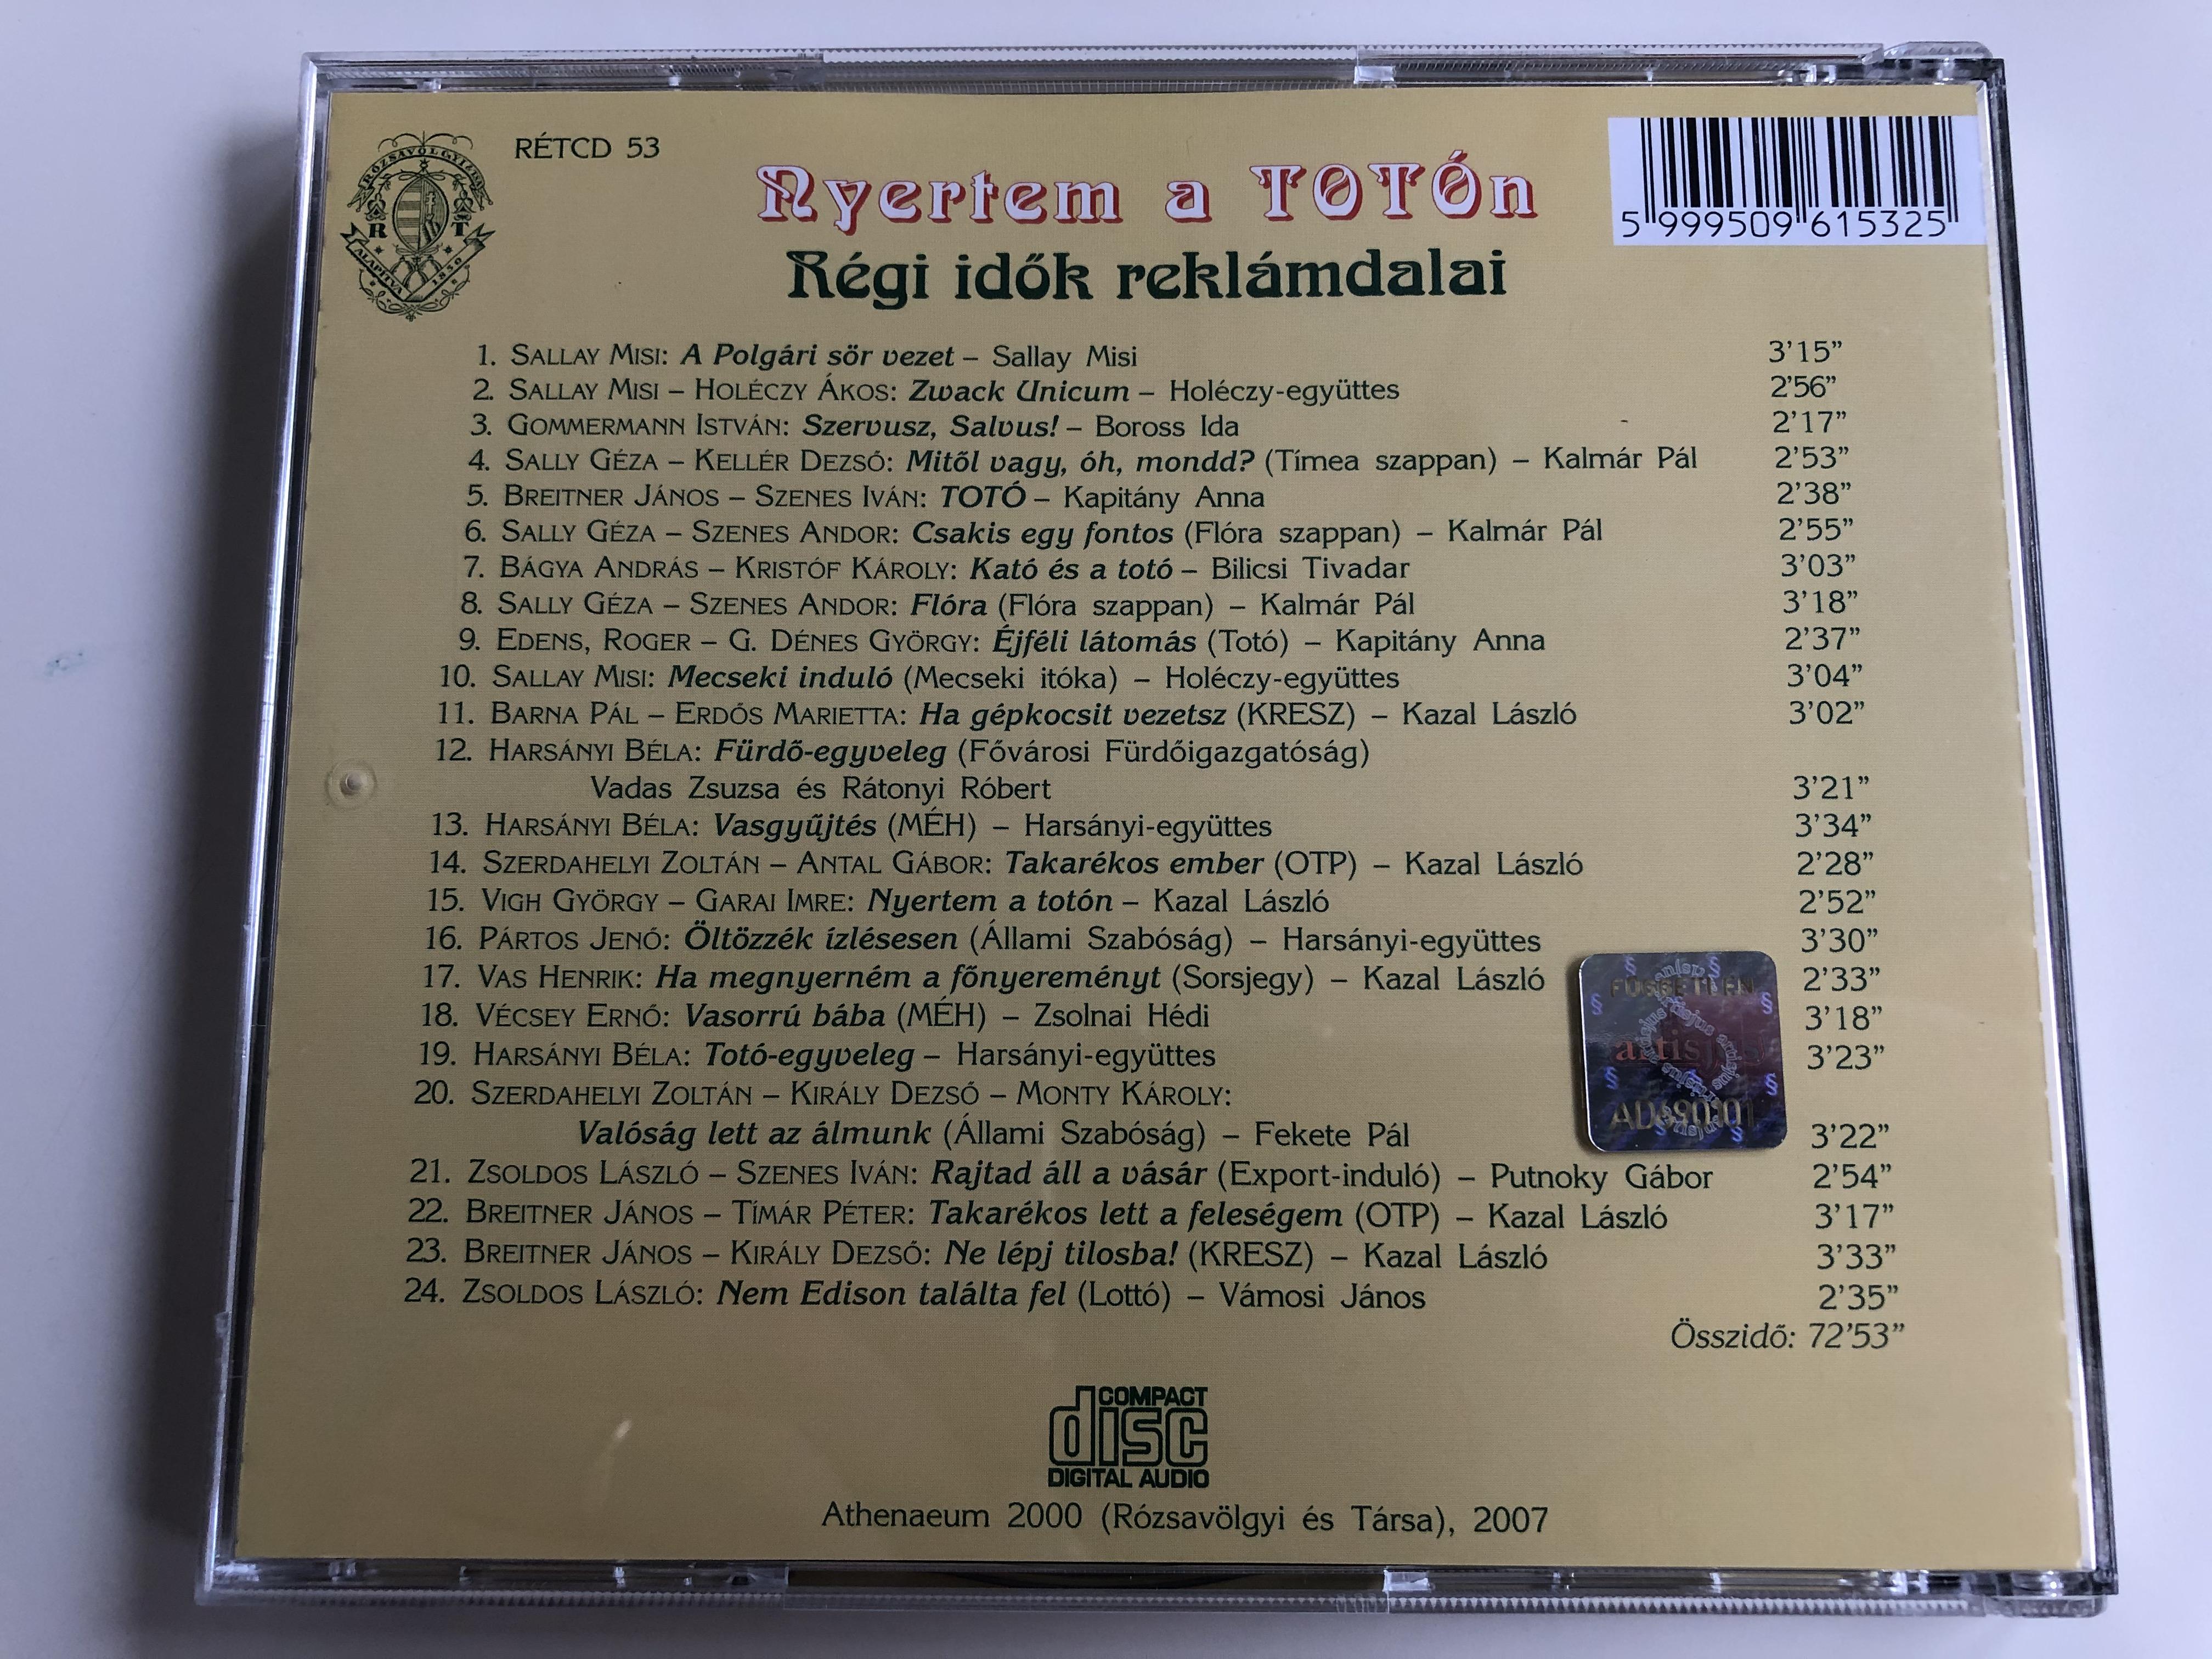 nyertem-a-tot-n-r-gi-id-k-rekl-mdalai-r-zsav-lgyi-s-t-rsa-audio-cd-2007-mono-r-tcd-53-6-.jpg